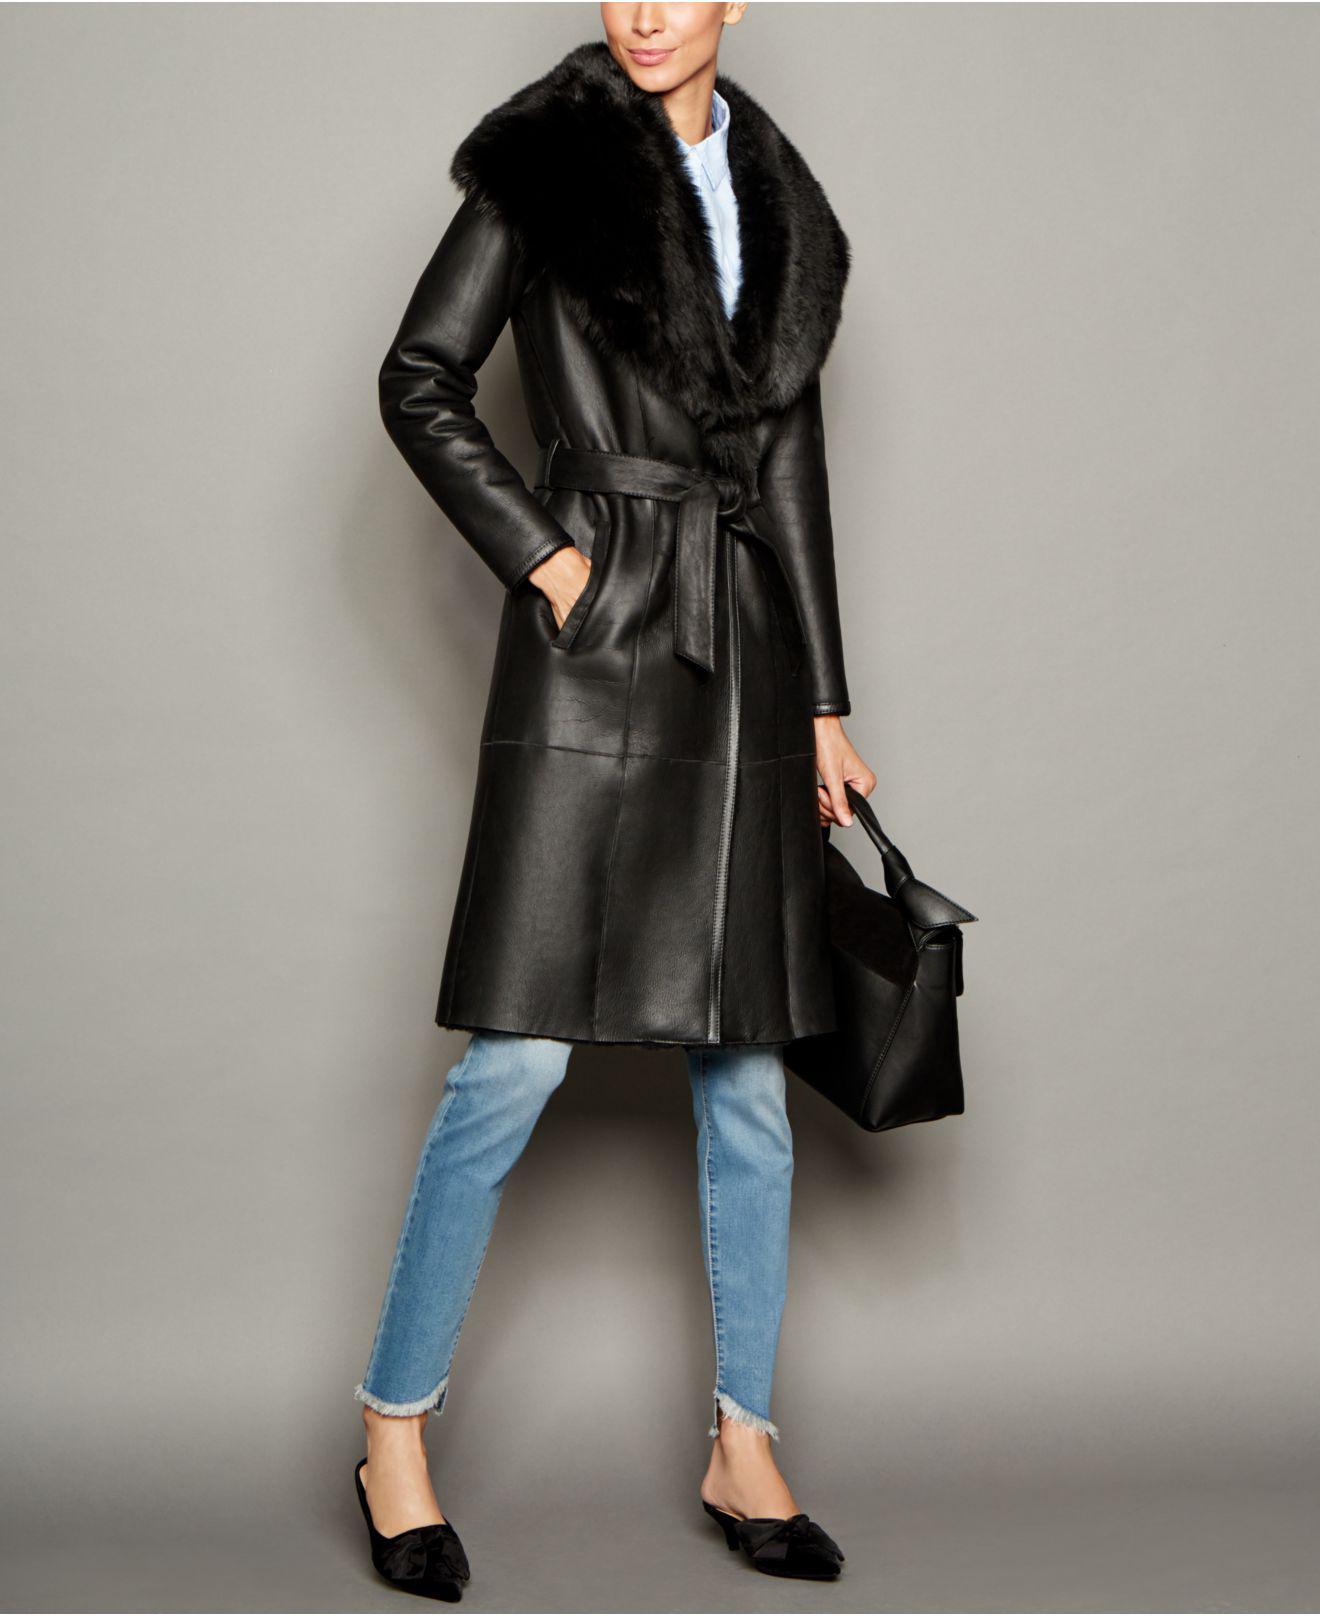 99c25256f6c Lyst - The Fur Vault Shearling Lamb Coat in Black